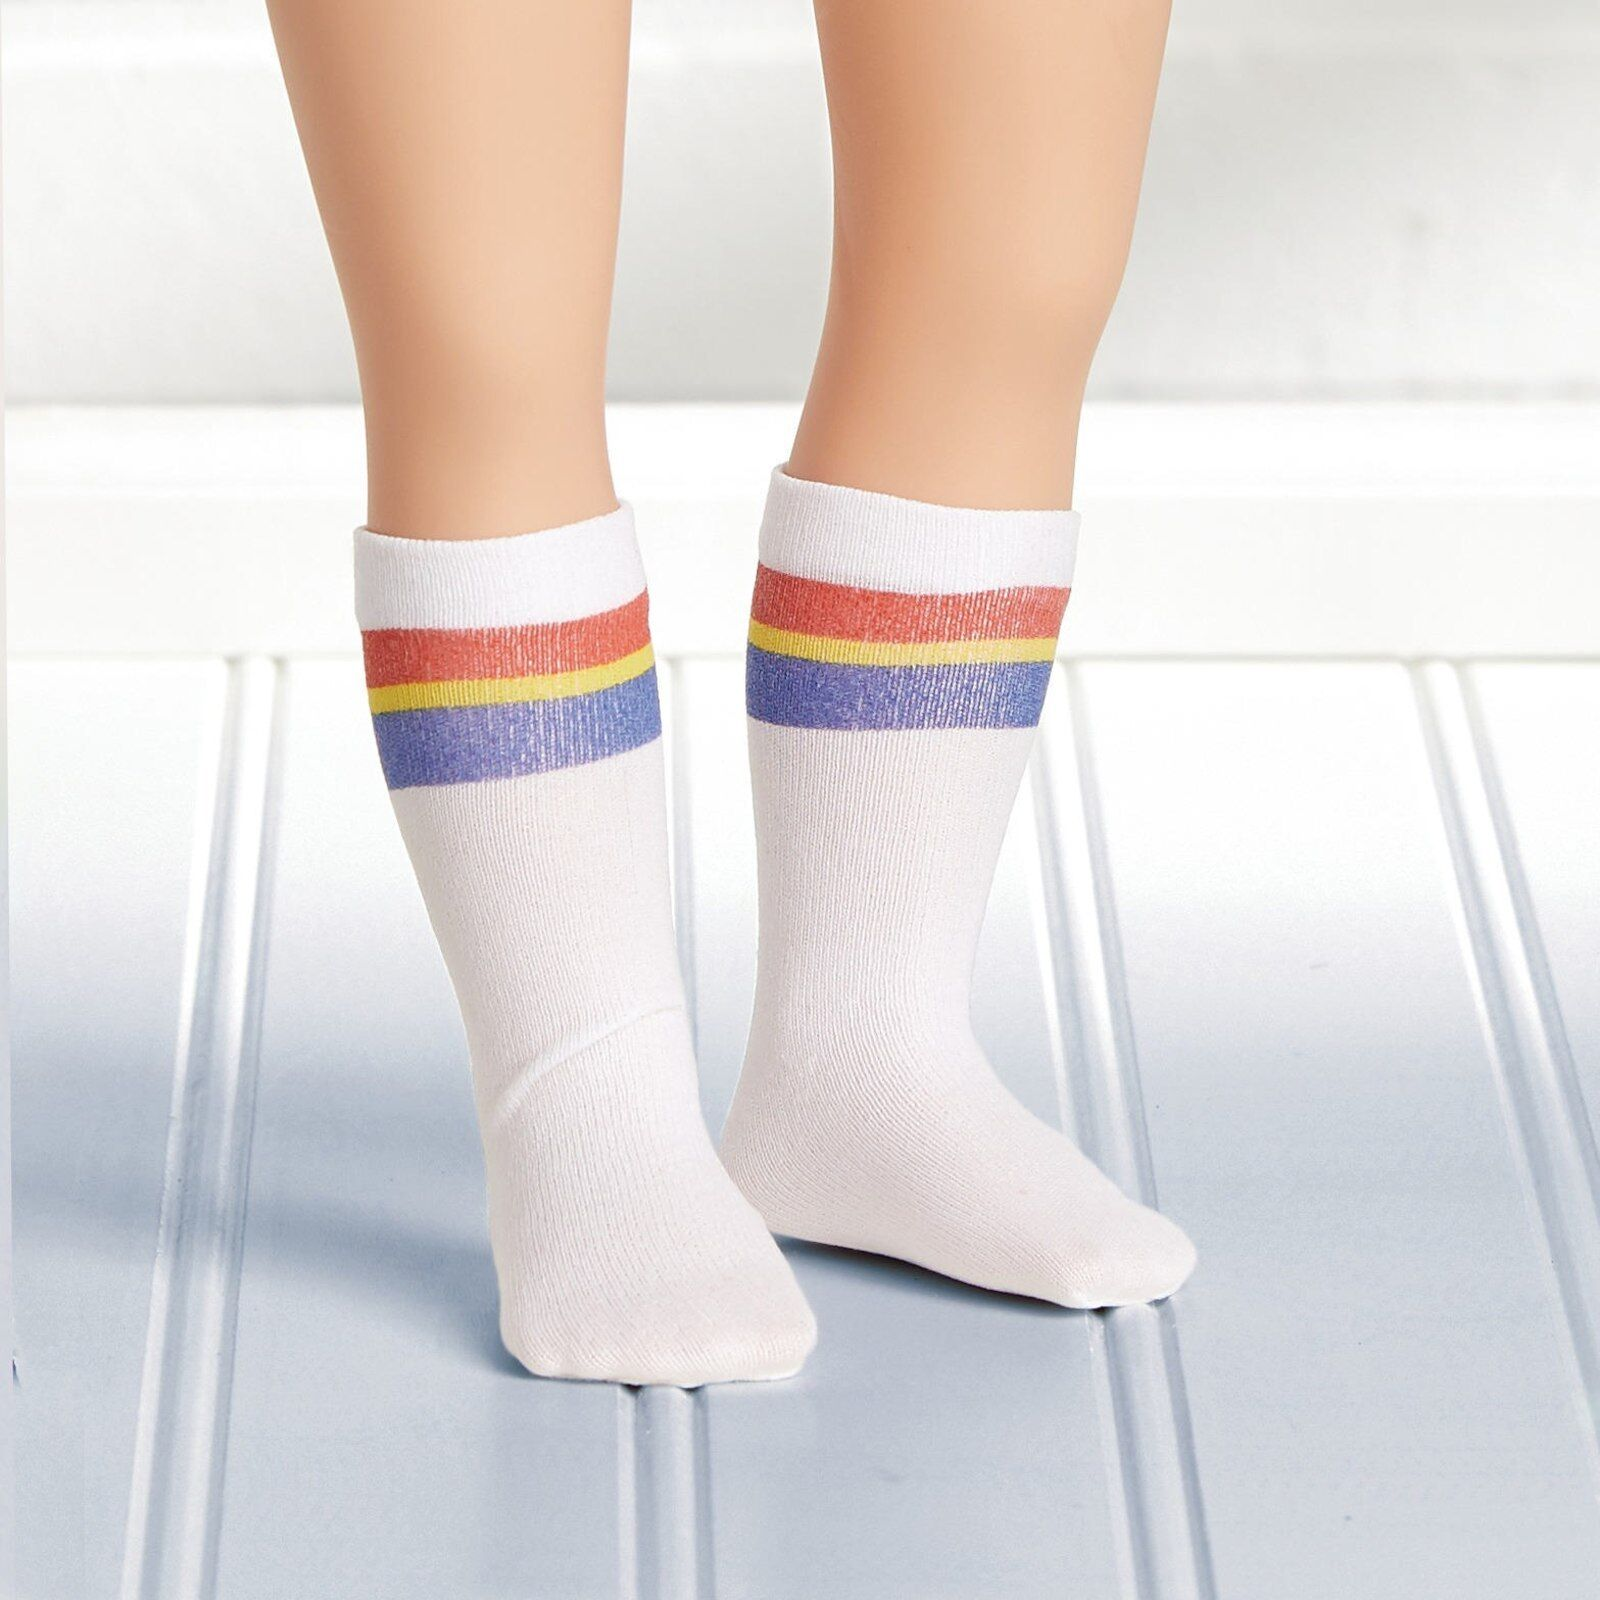 Toys R Us Journey Girls Legwear Set - Fox Socks 18 Journey Girl Dolls - $24.99